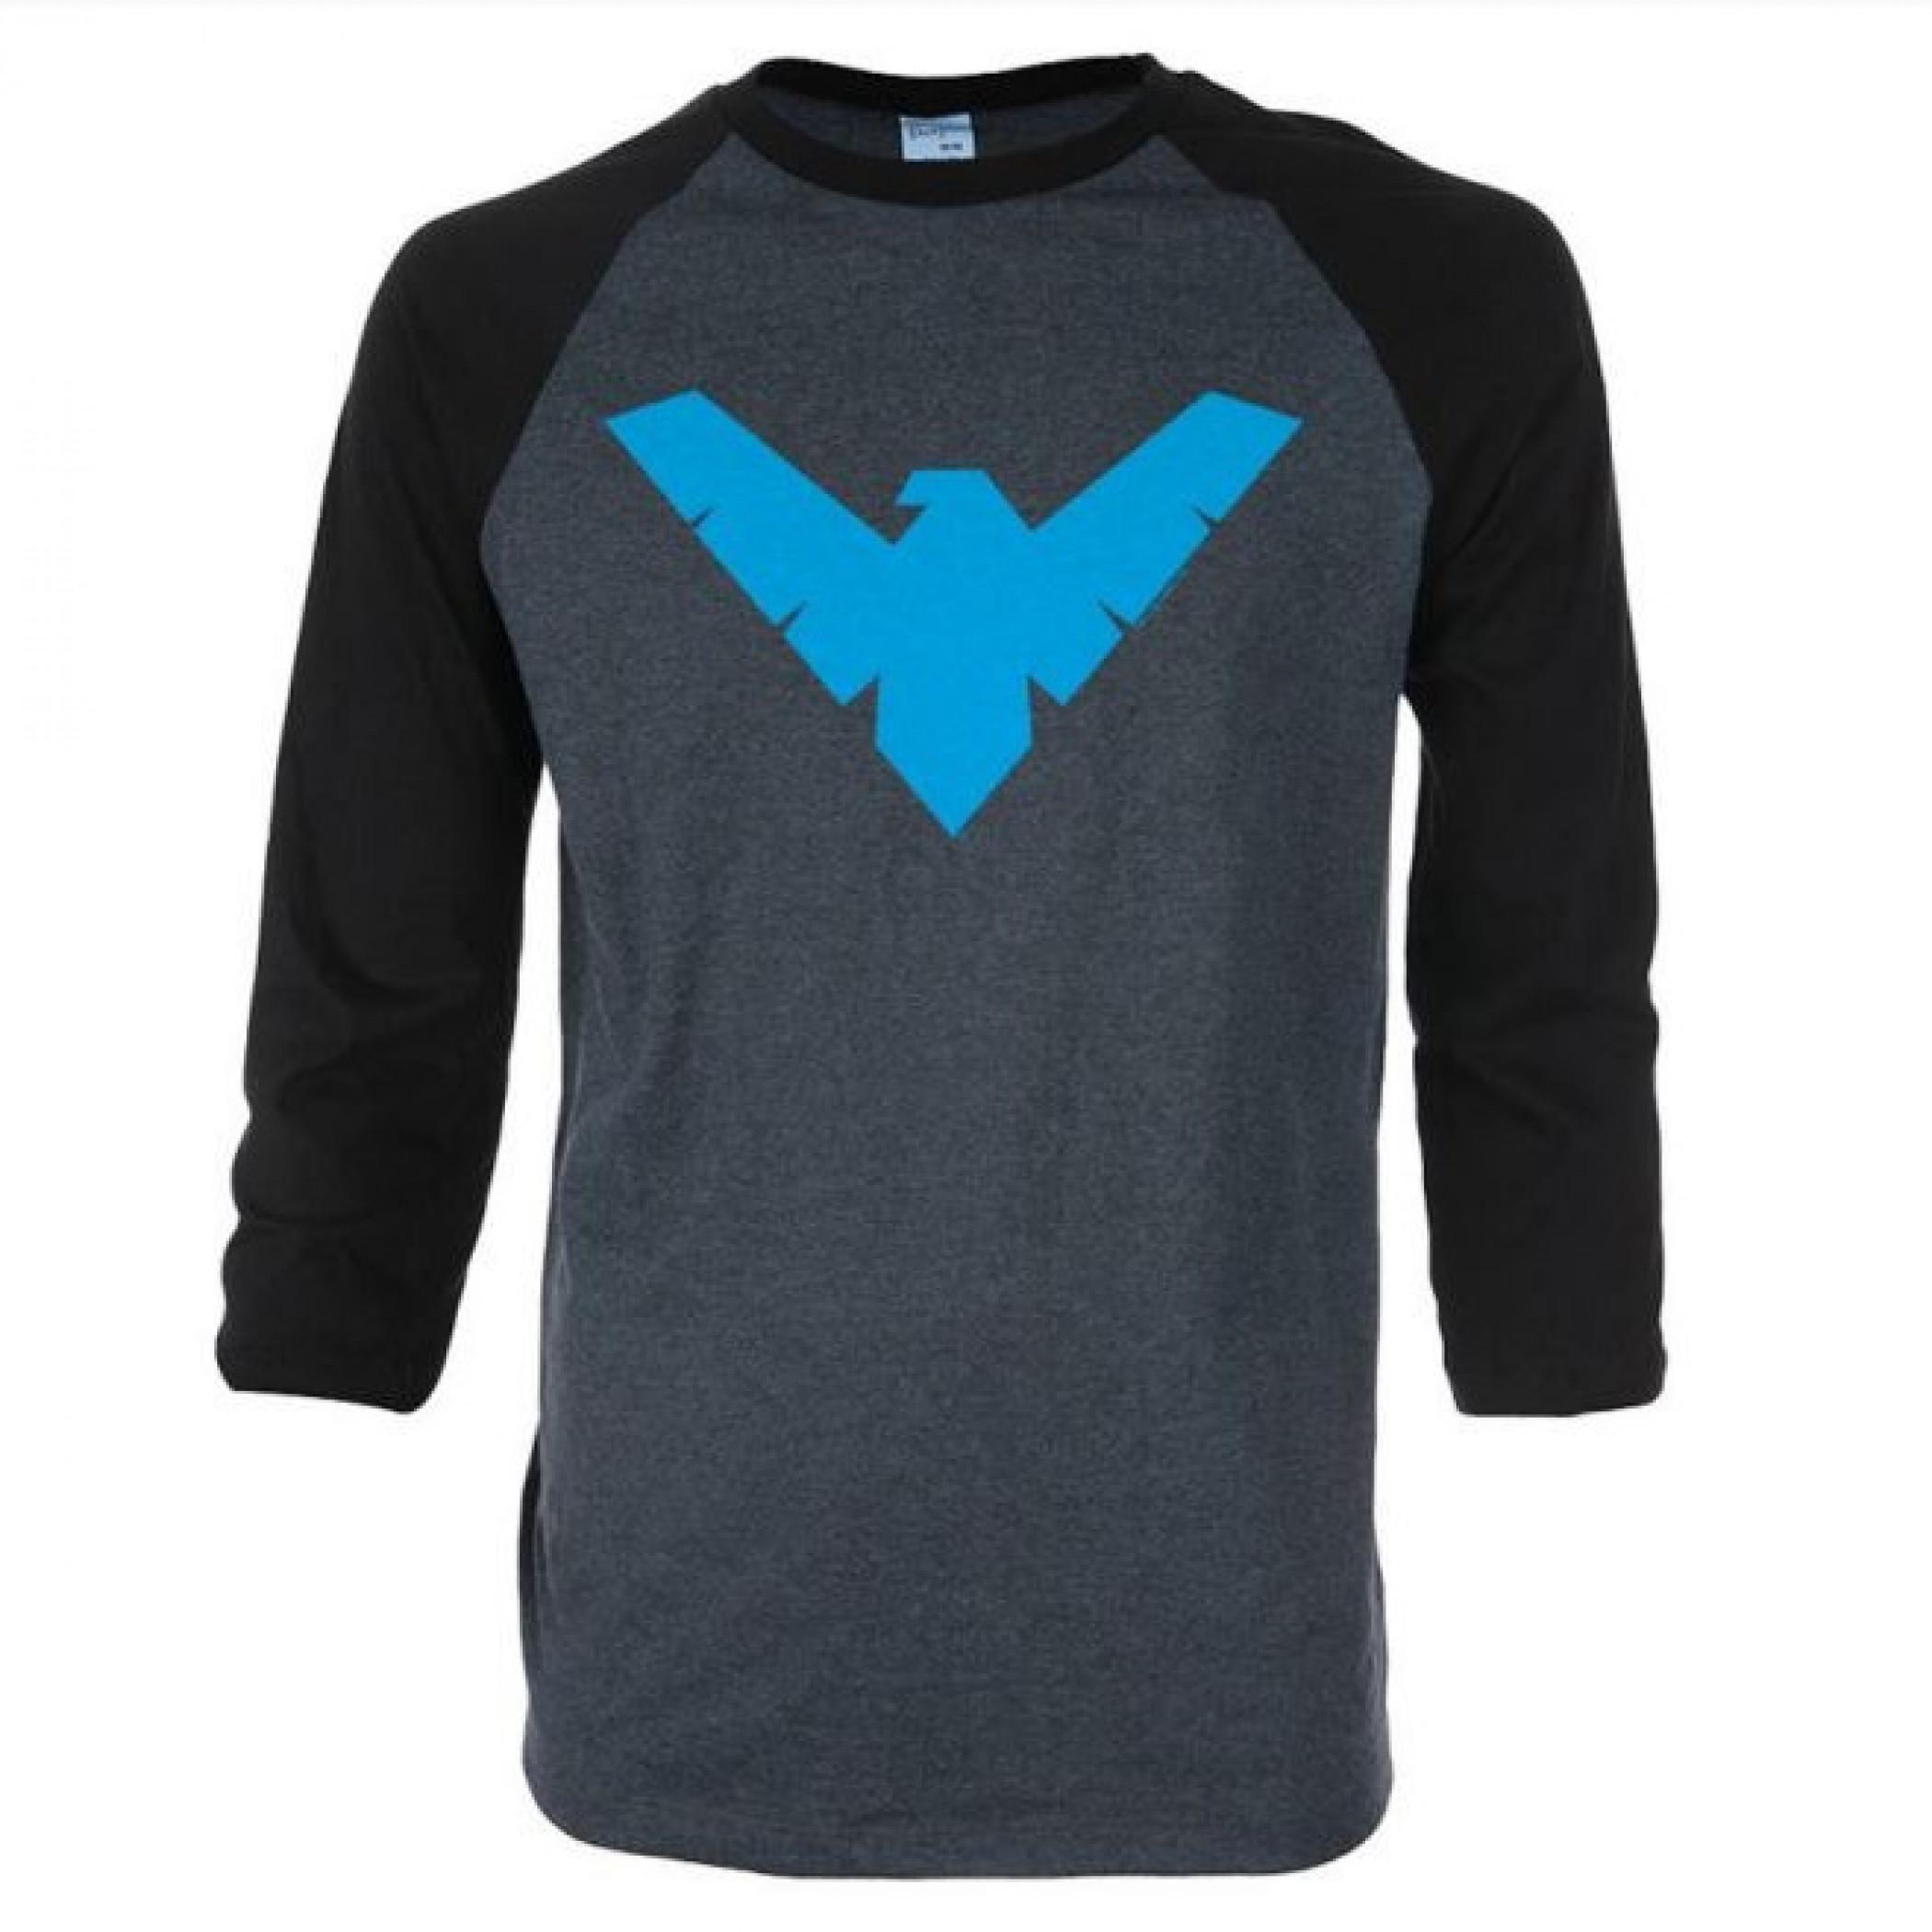 Nightwing Symbol 3/4 Sleeve Raglan Baseball T-Shirt